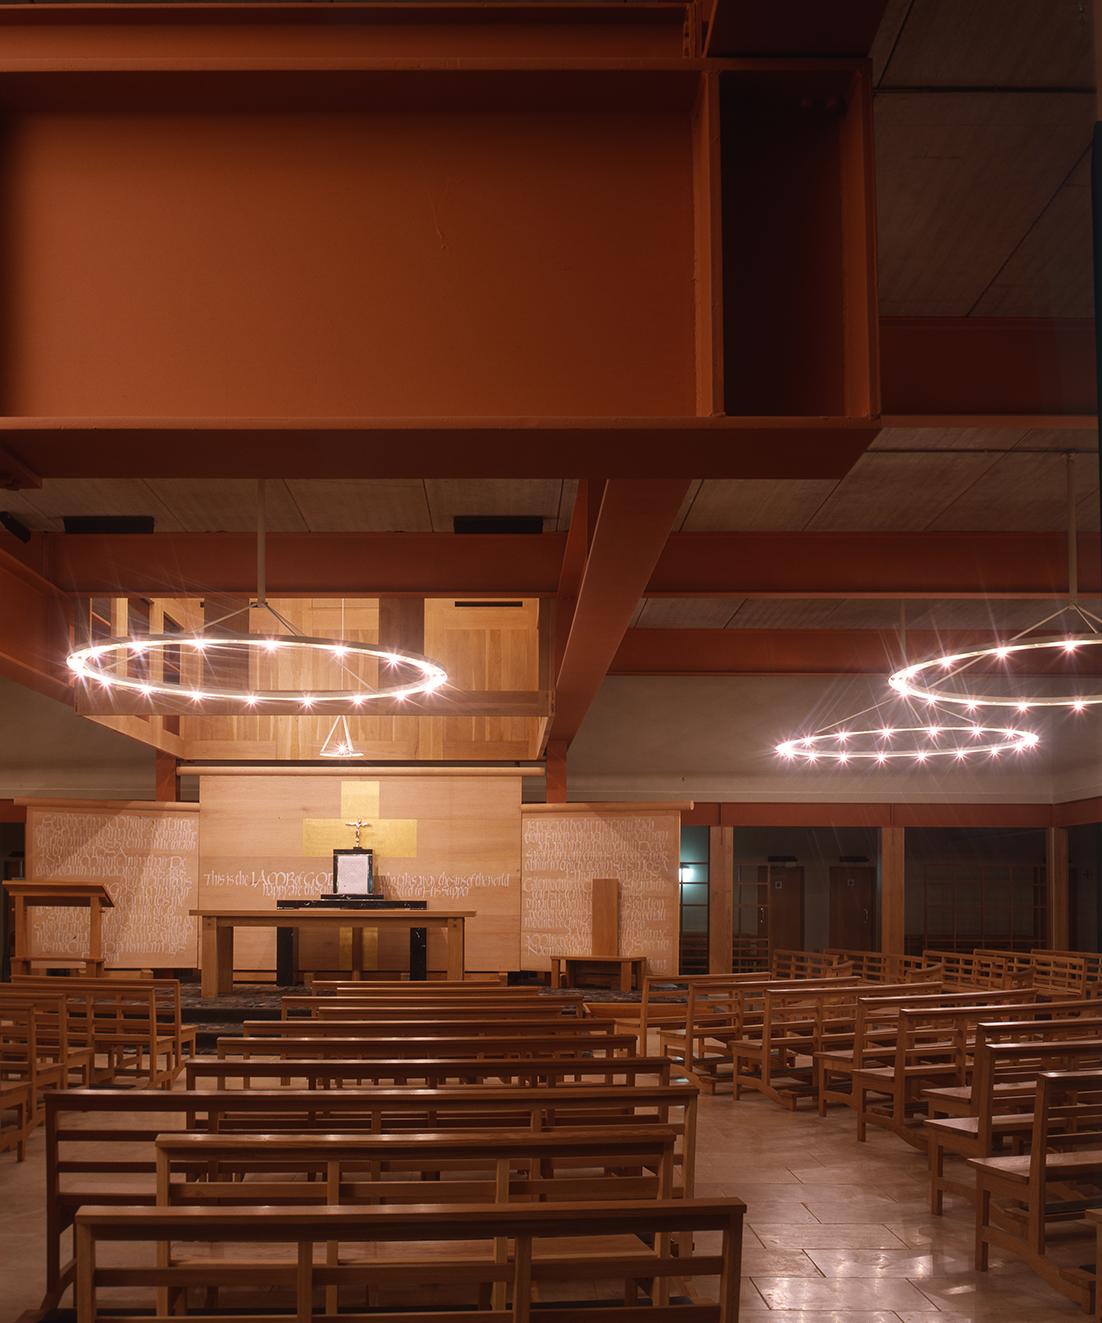 1 Chapel fo Reconciliation, Knock - Interior